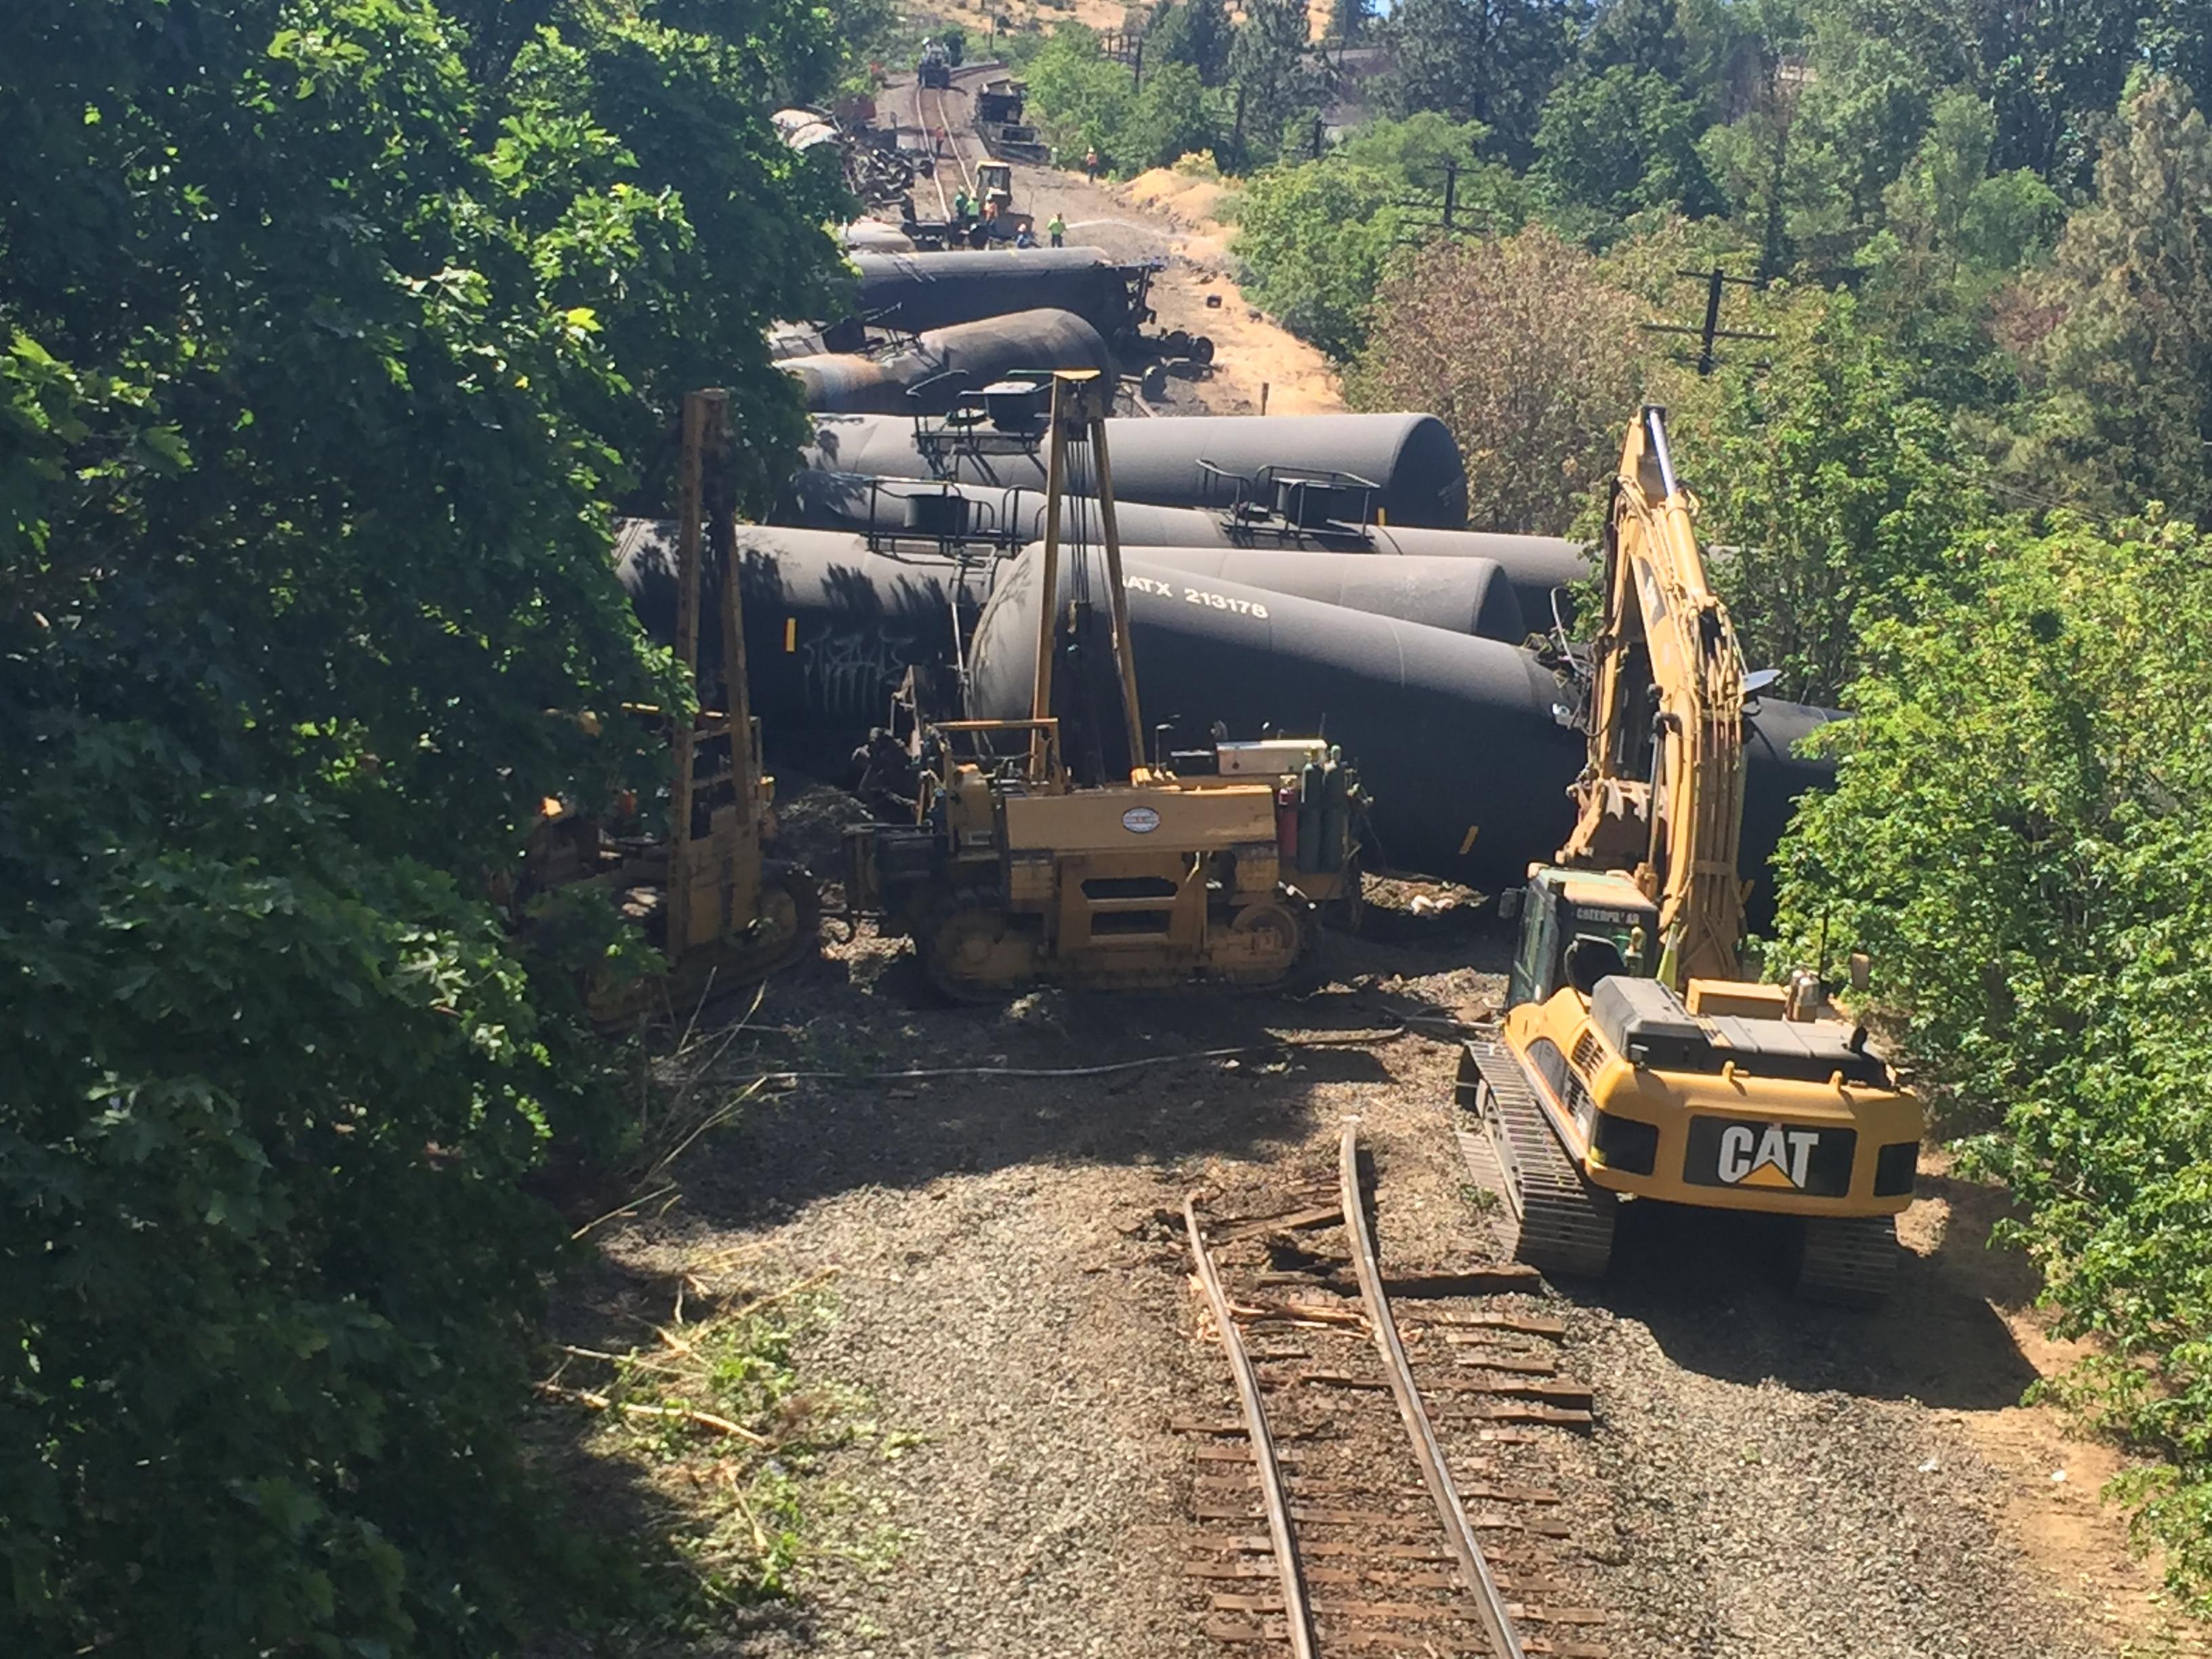 oregon-train-derailment_27365585192_o